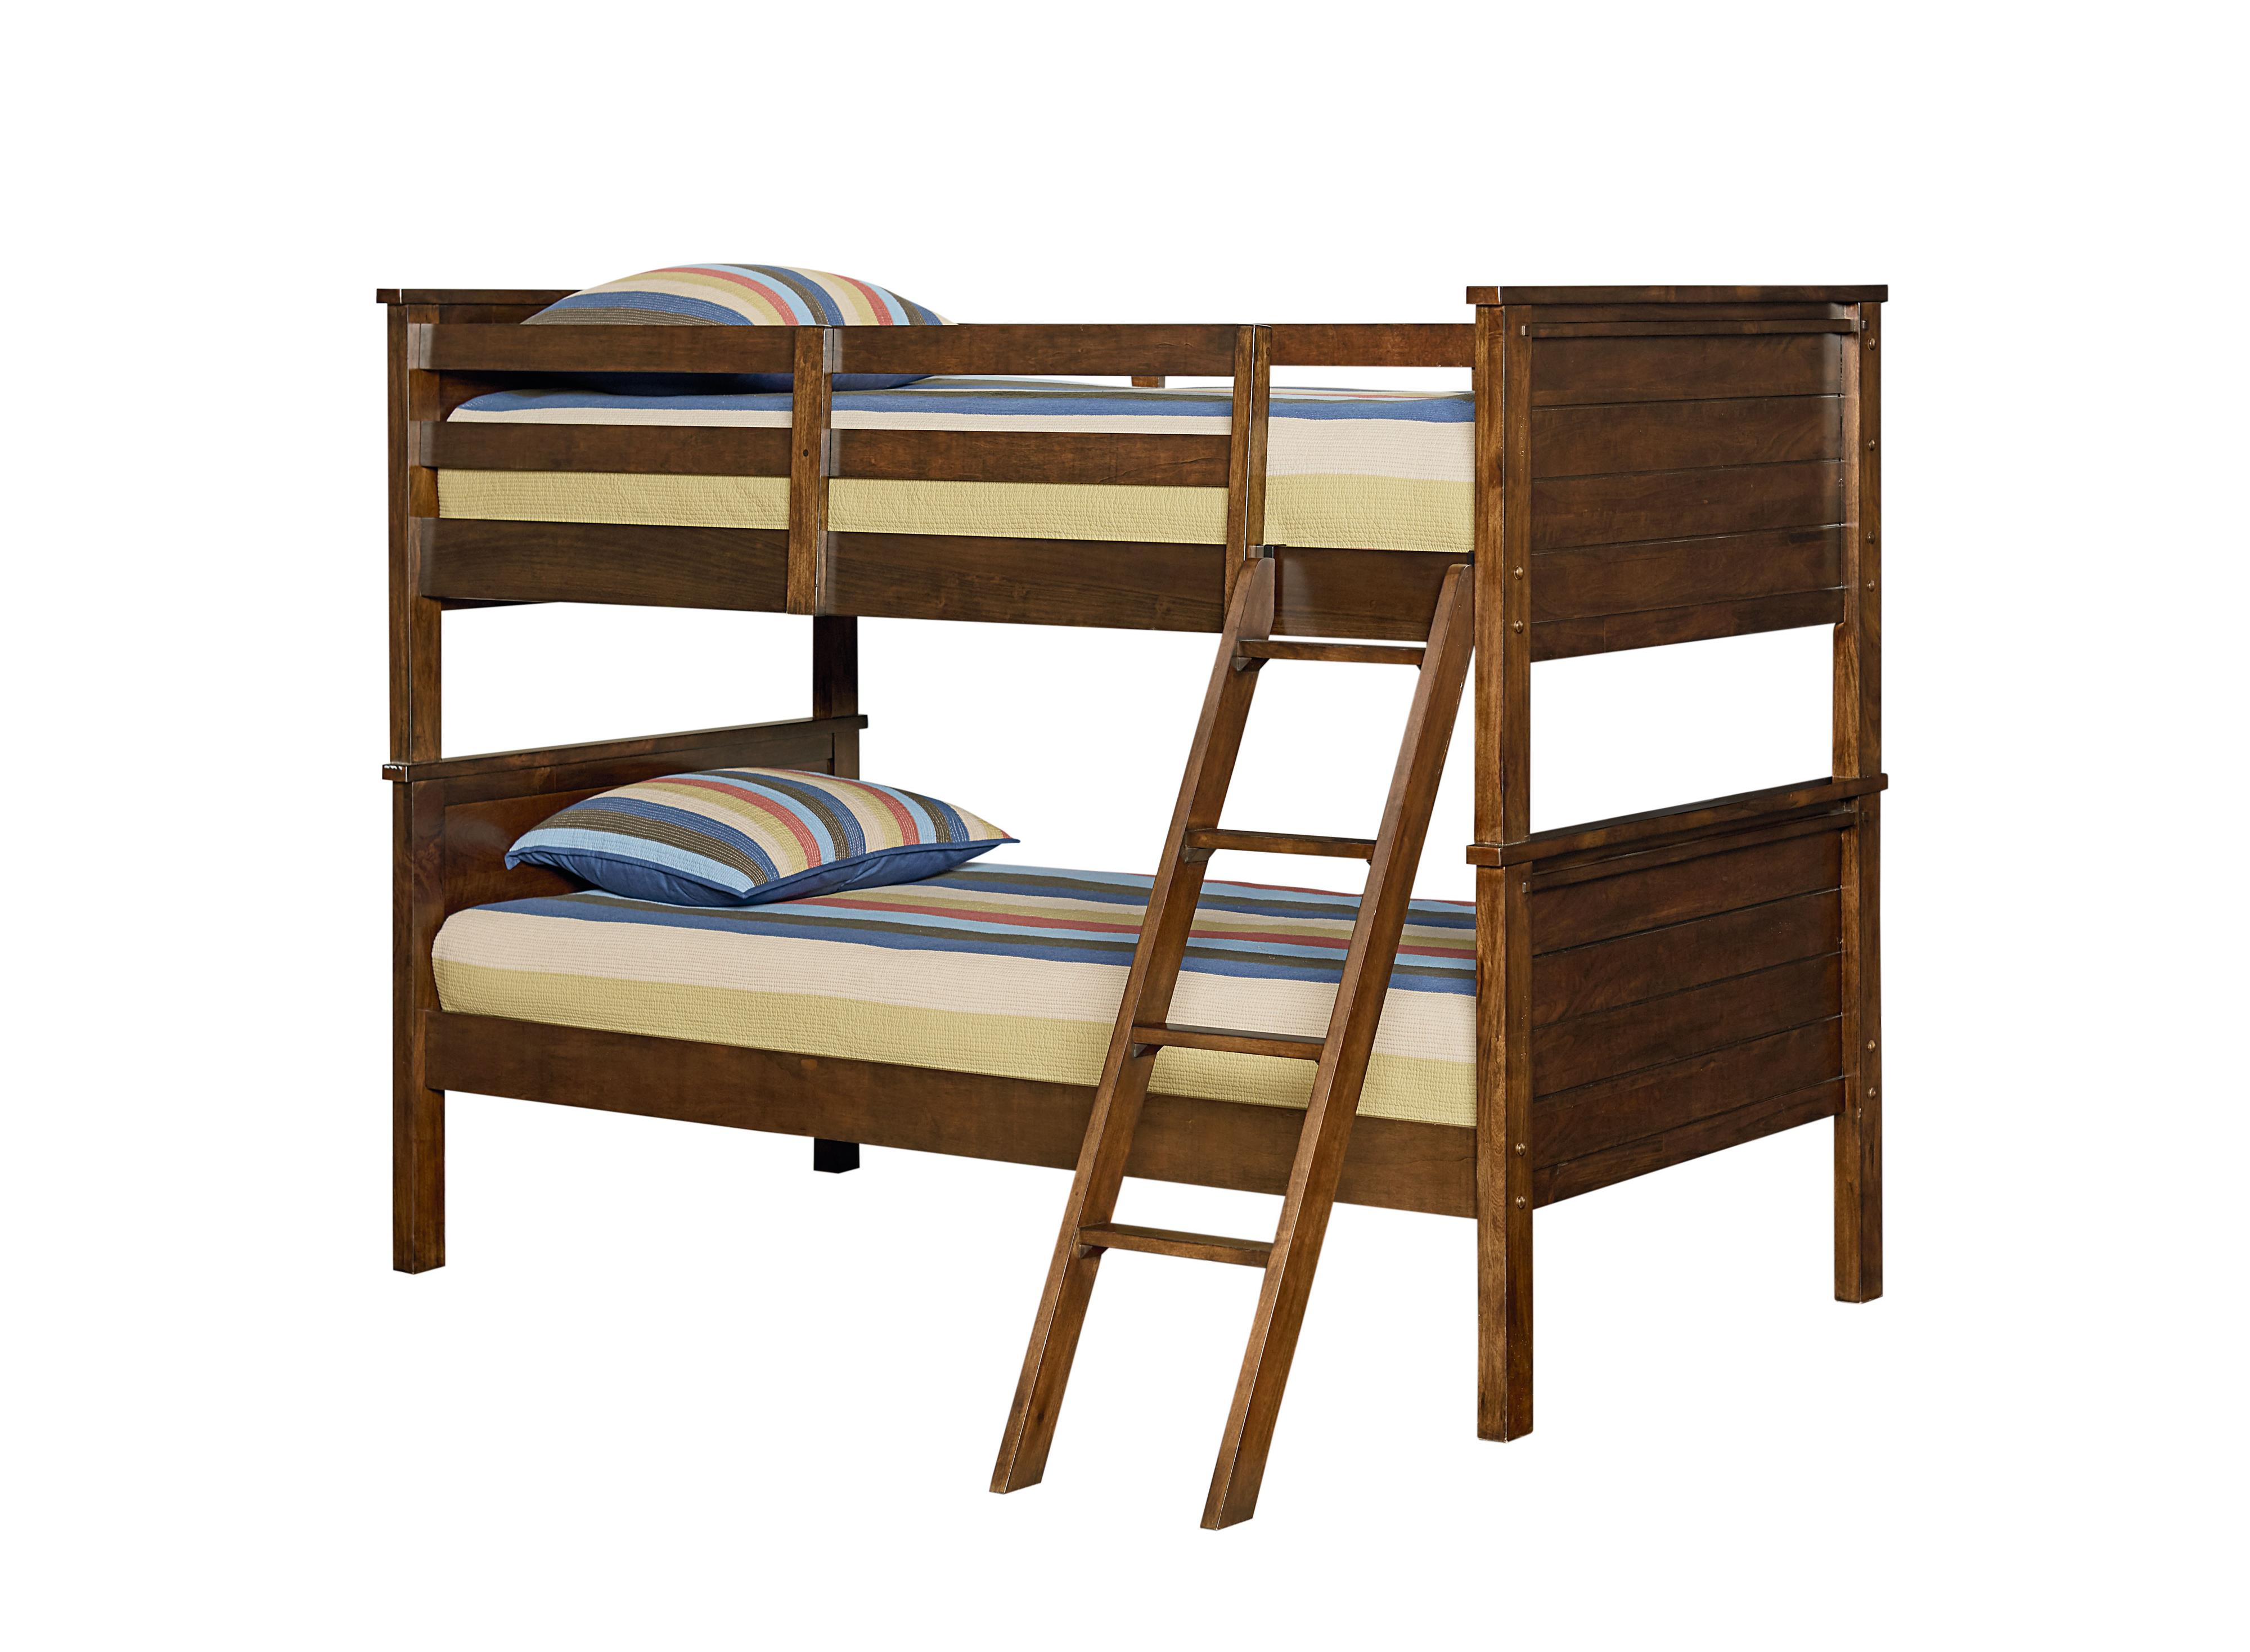 Standard Furniture Cameron Youth Bunk Bed - Item Number: 94071+2094071